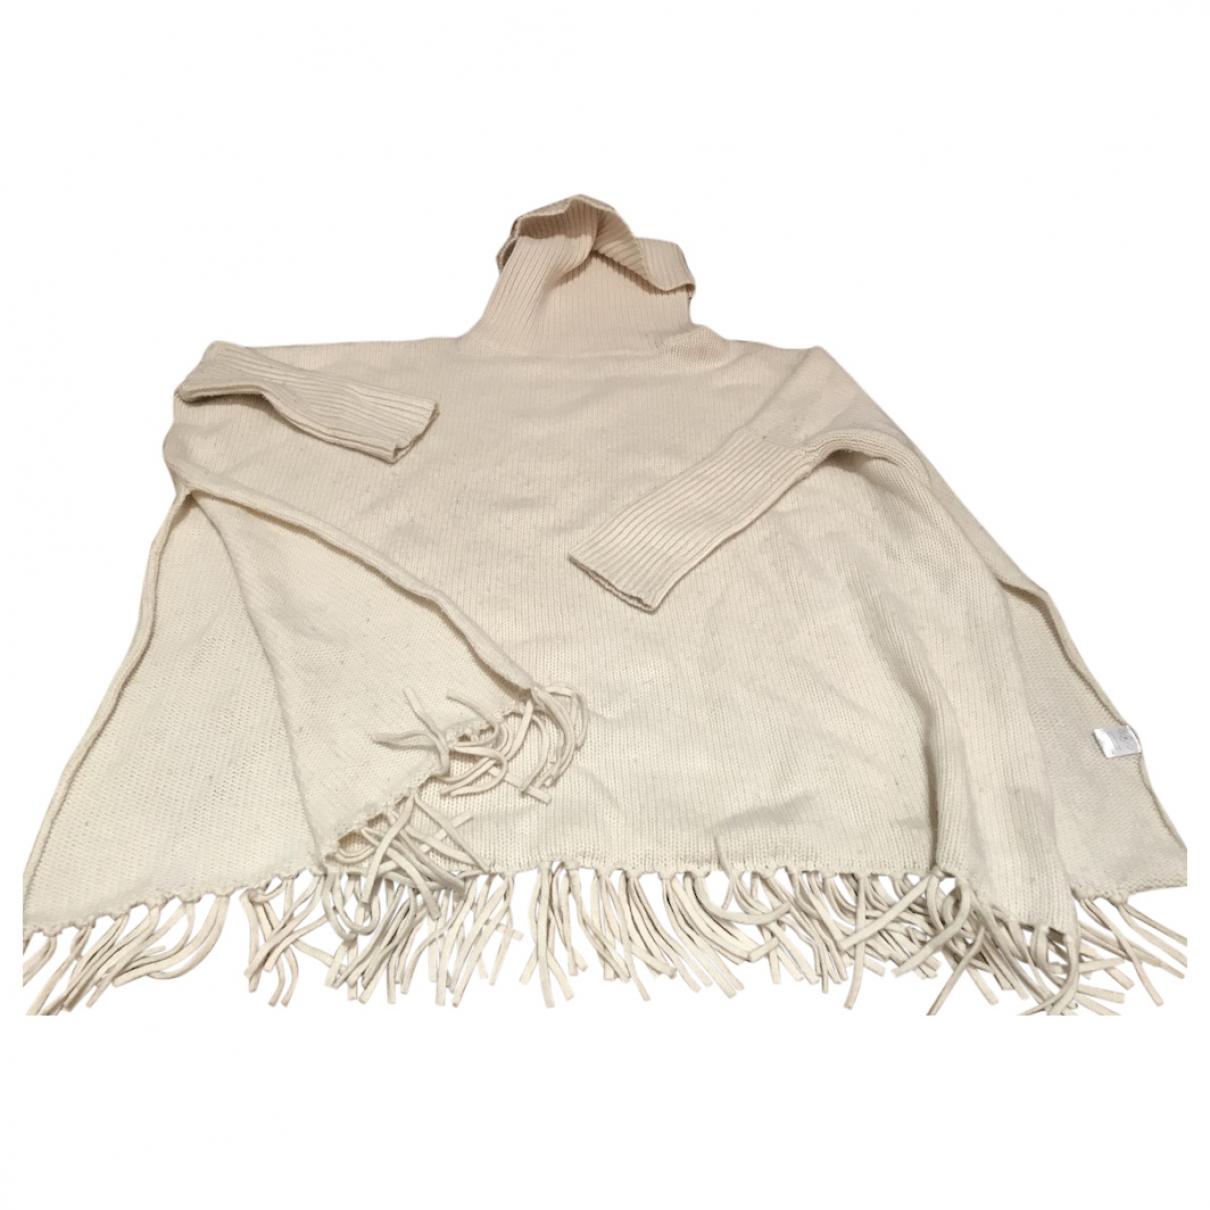 Kujten - Pull   pour femme en cachemire - beige